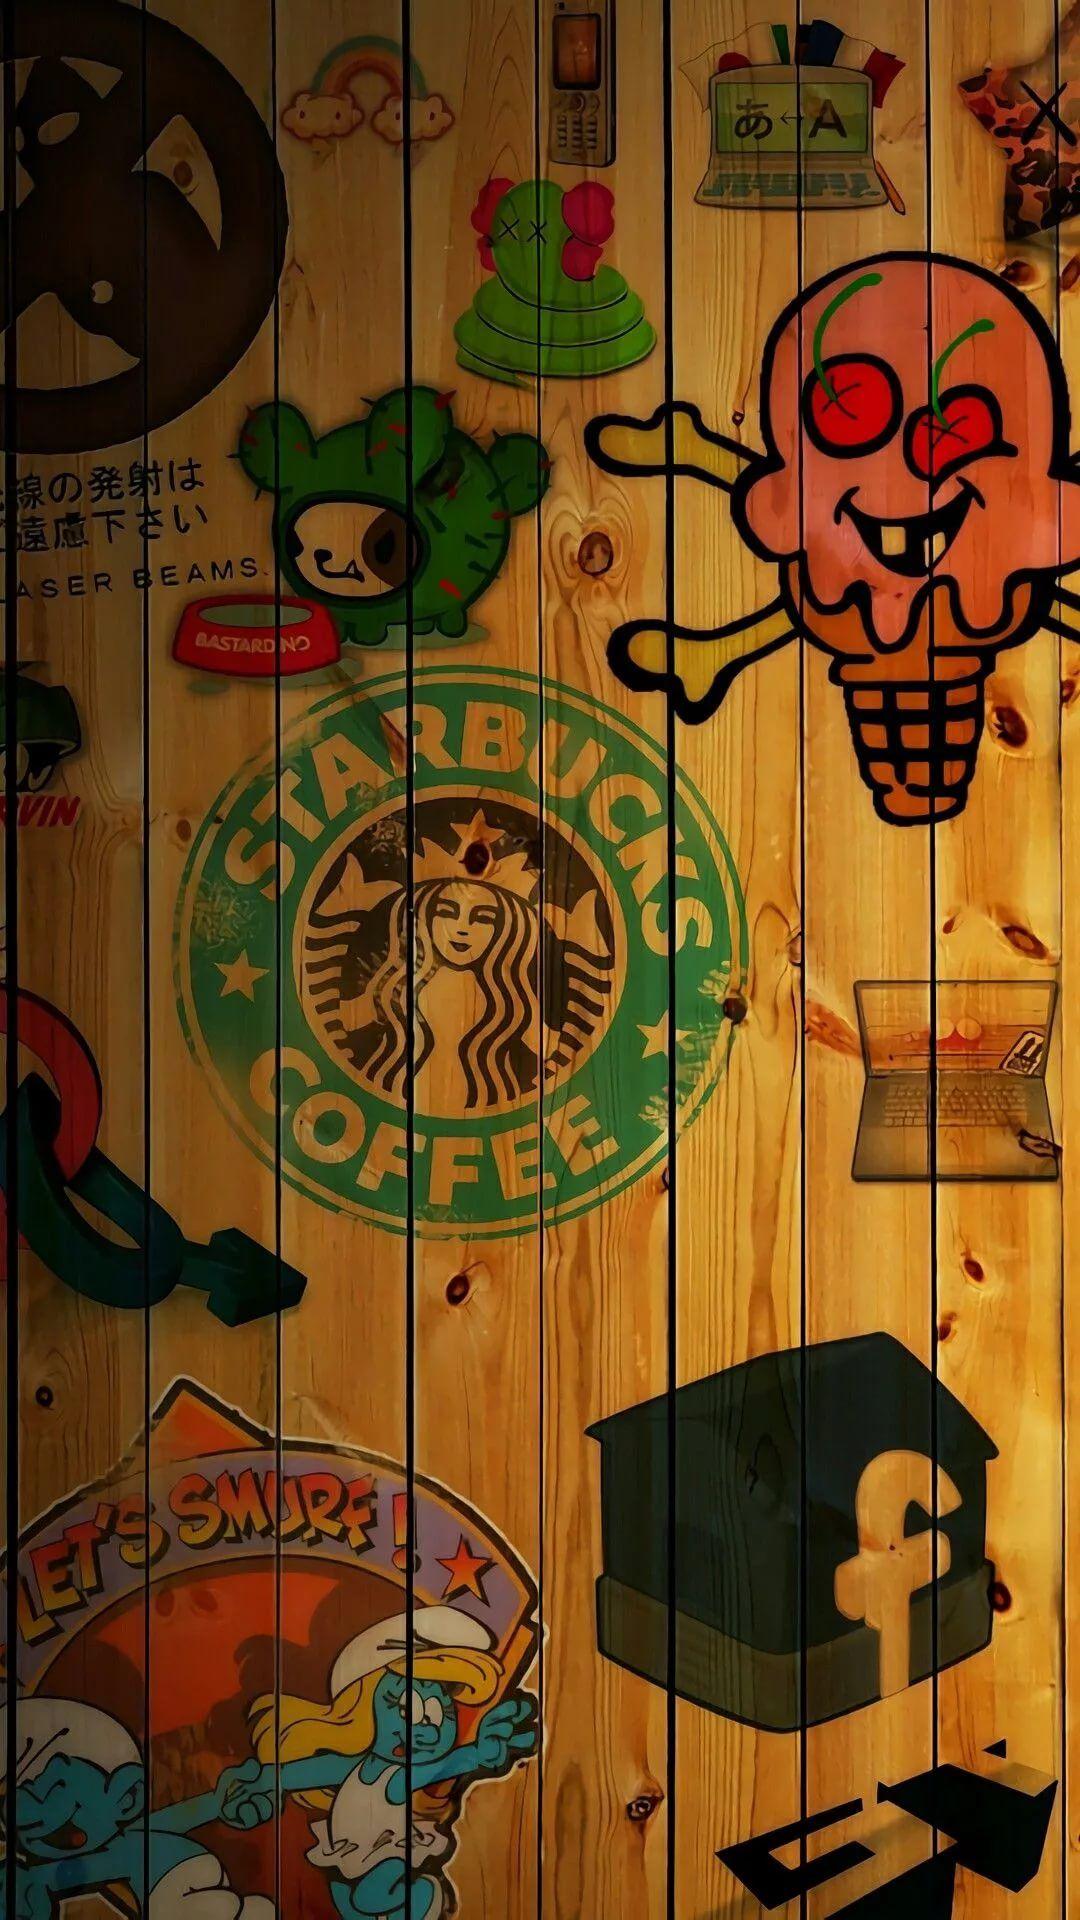 Starbucks wallpaper iPhone 5